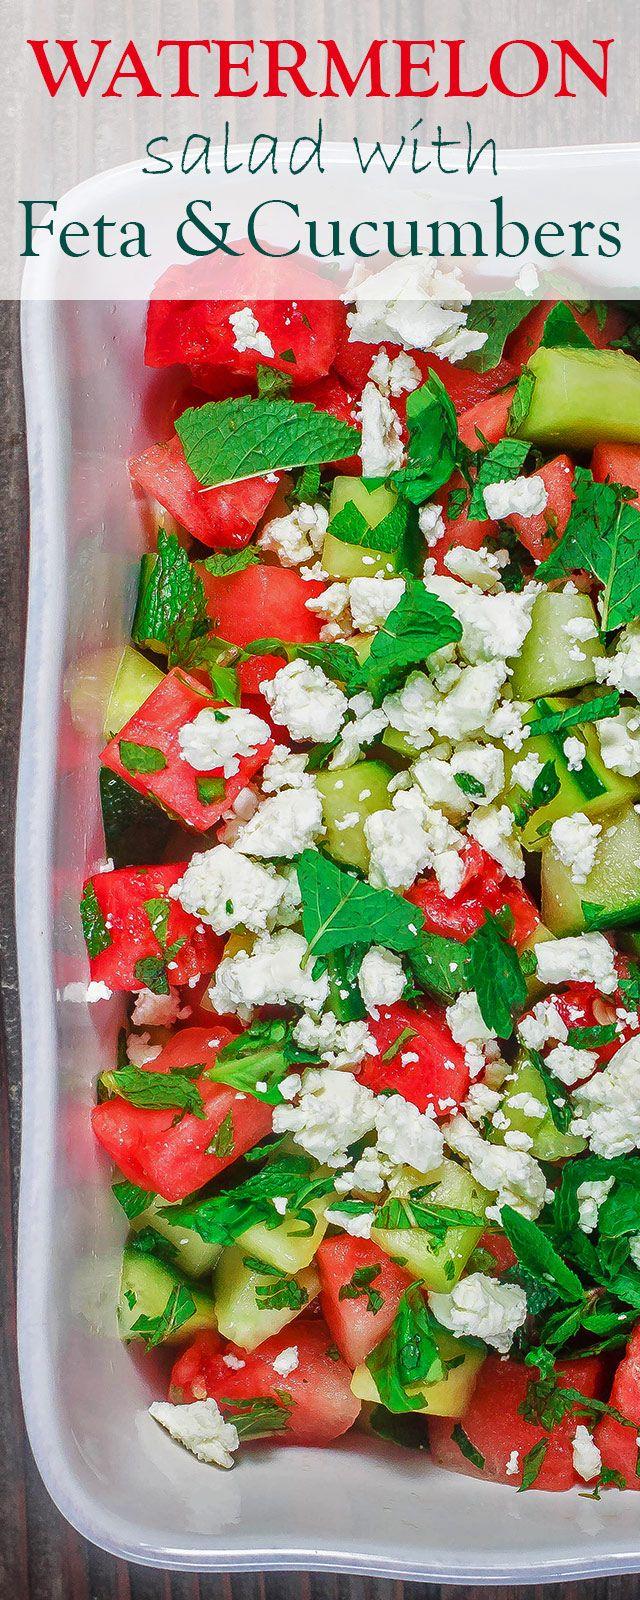 Mediterranean Watermelon Salad Recipe | The Mediterranean Dish. A light and fresh watermelon salad with cucumbers, feta cheese and fresh herbs. All dressed in a honey vinaigrette. @themeddish